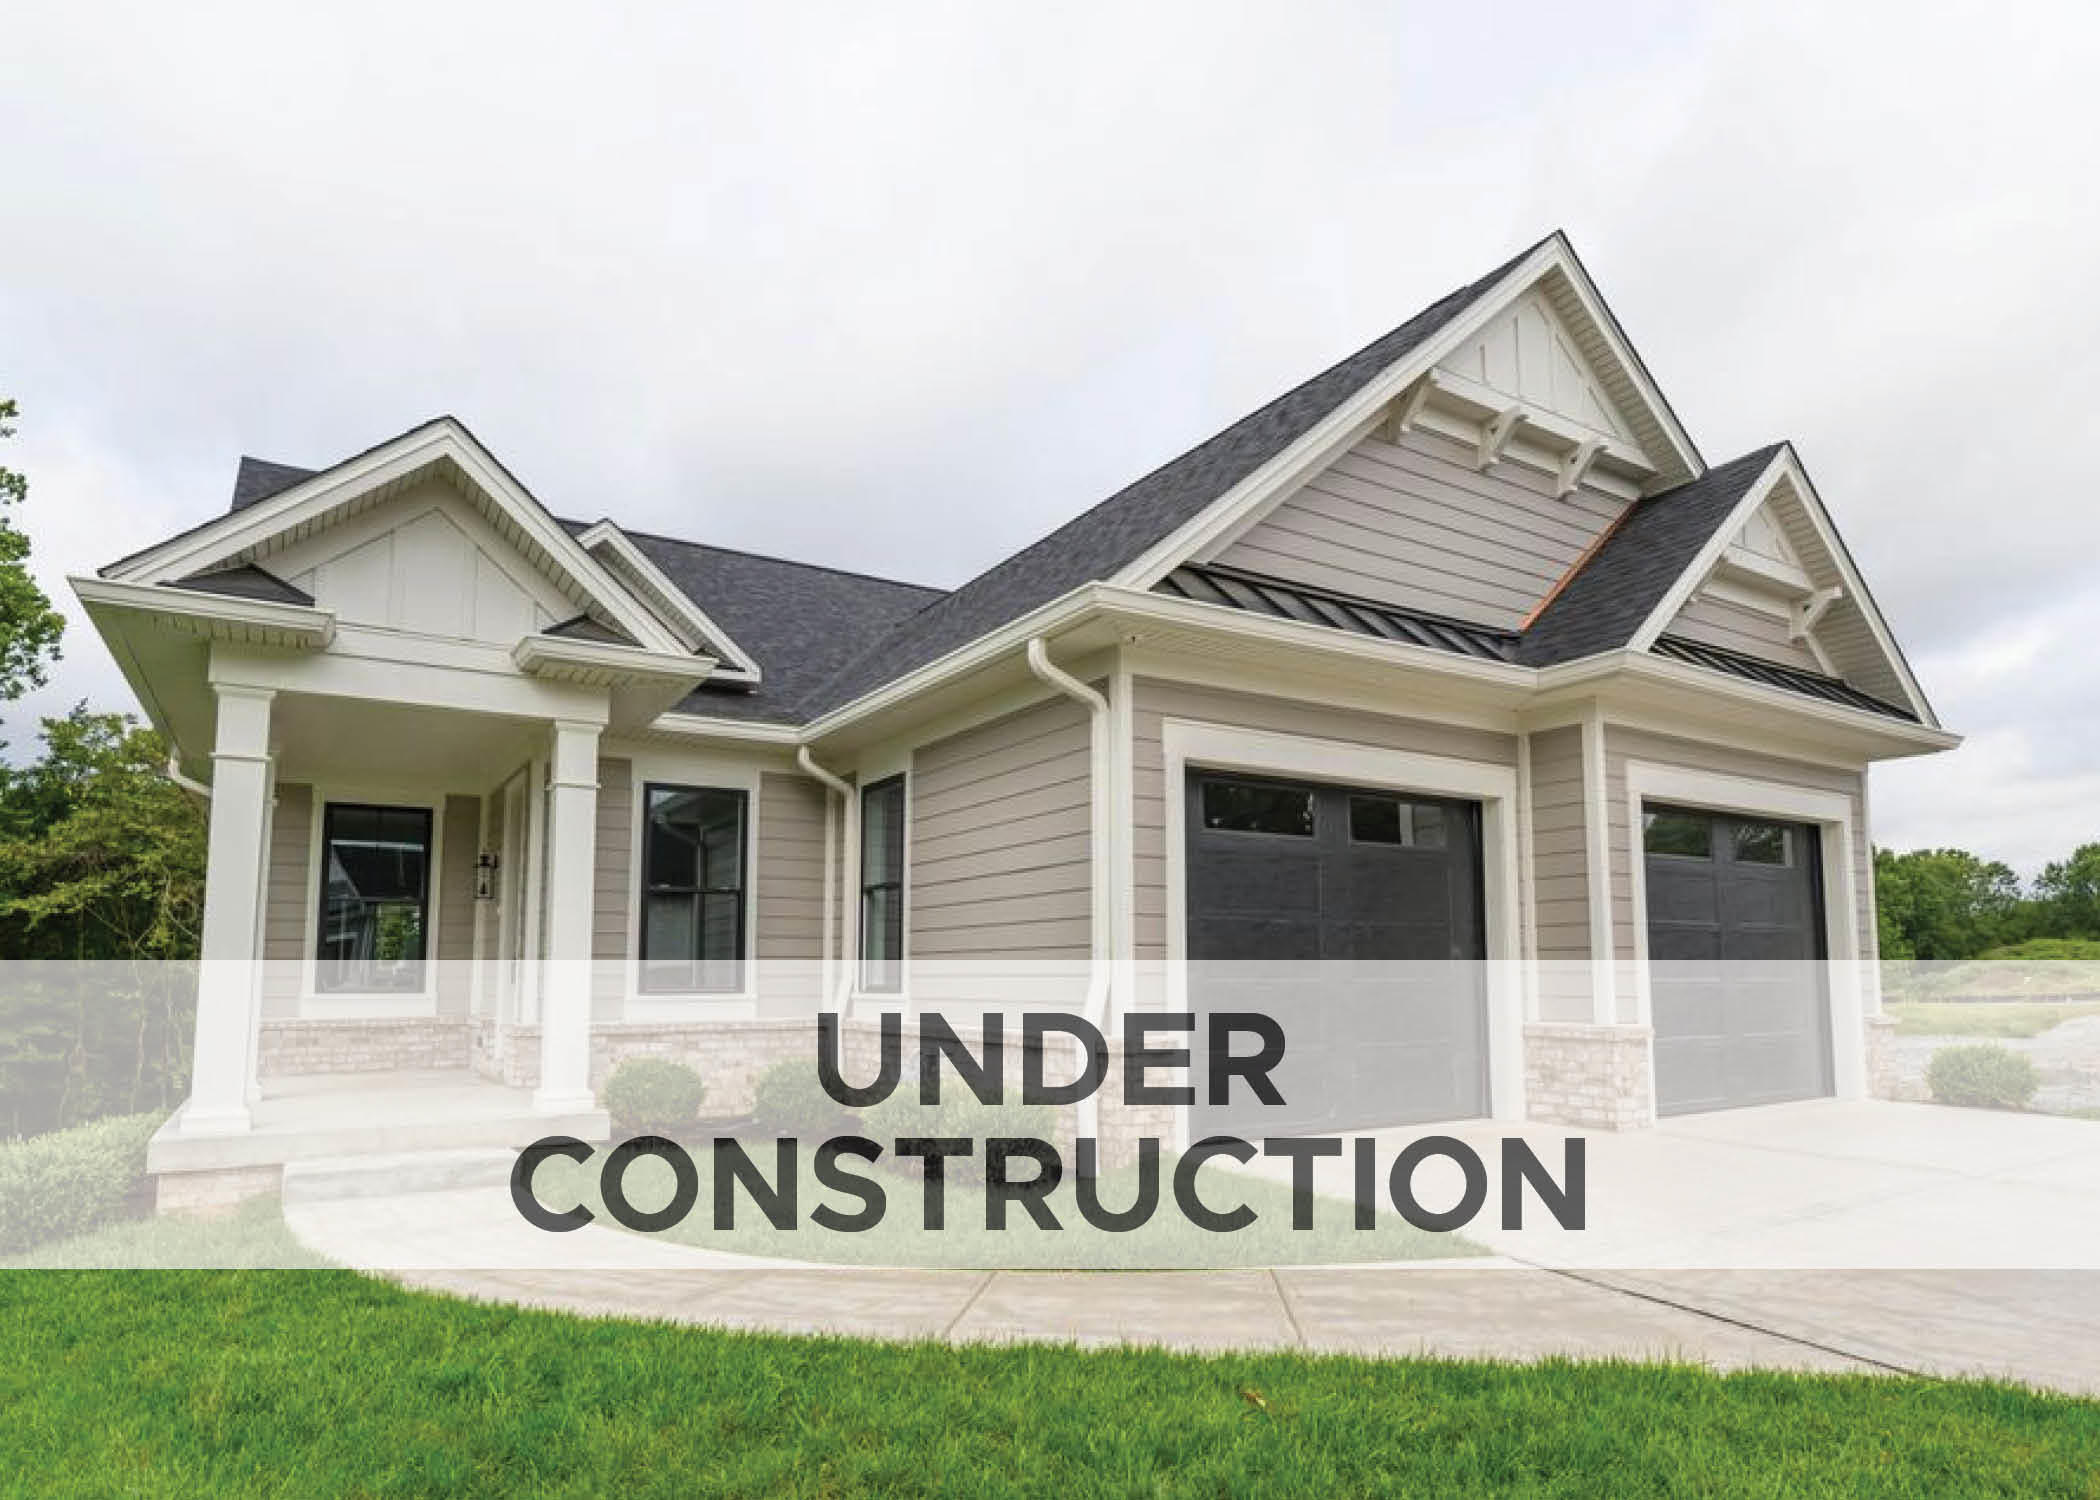 3532 Harper Woods Lane, Lexington, KY 40515